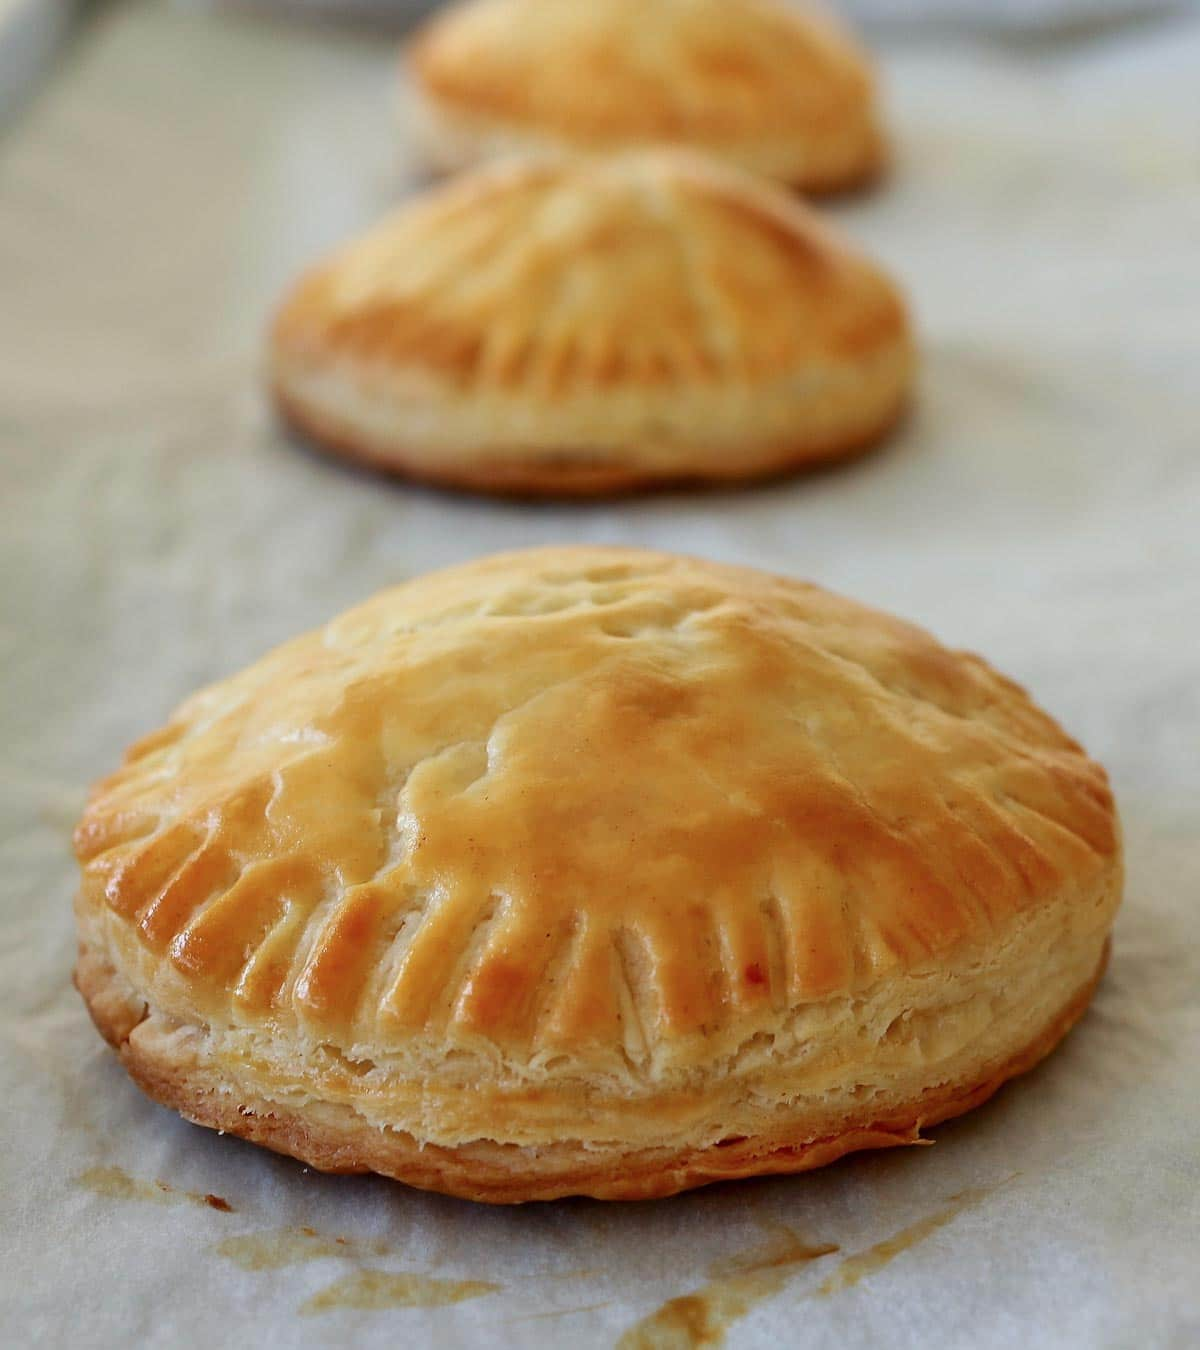 Closeup of a row of round baked empanadas on a baking sheet.